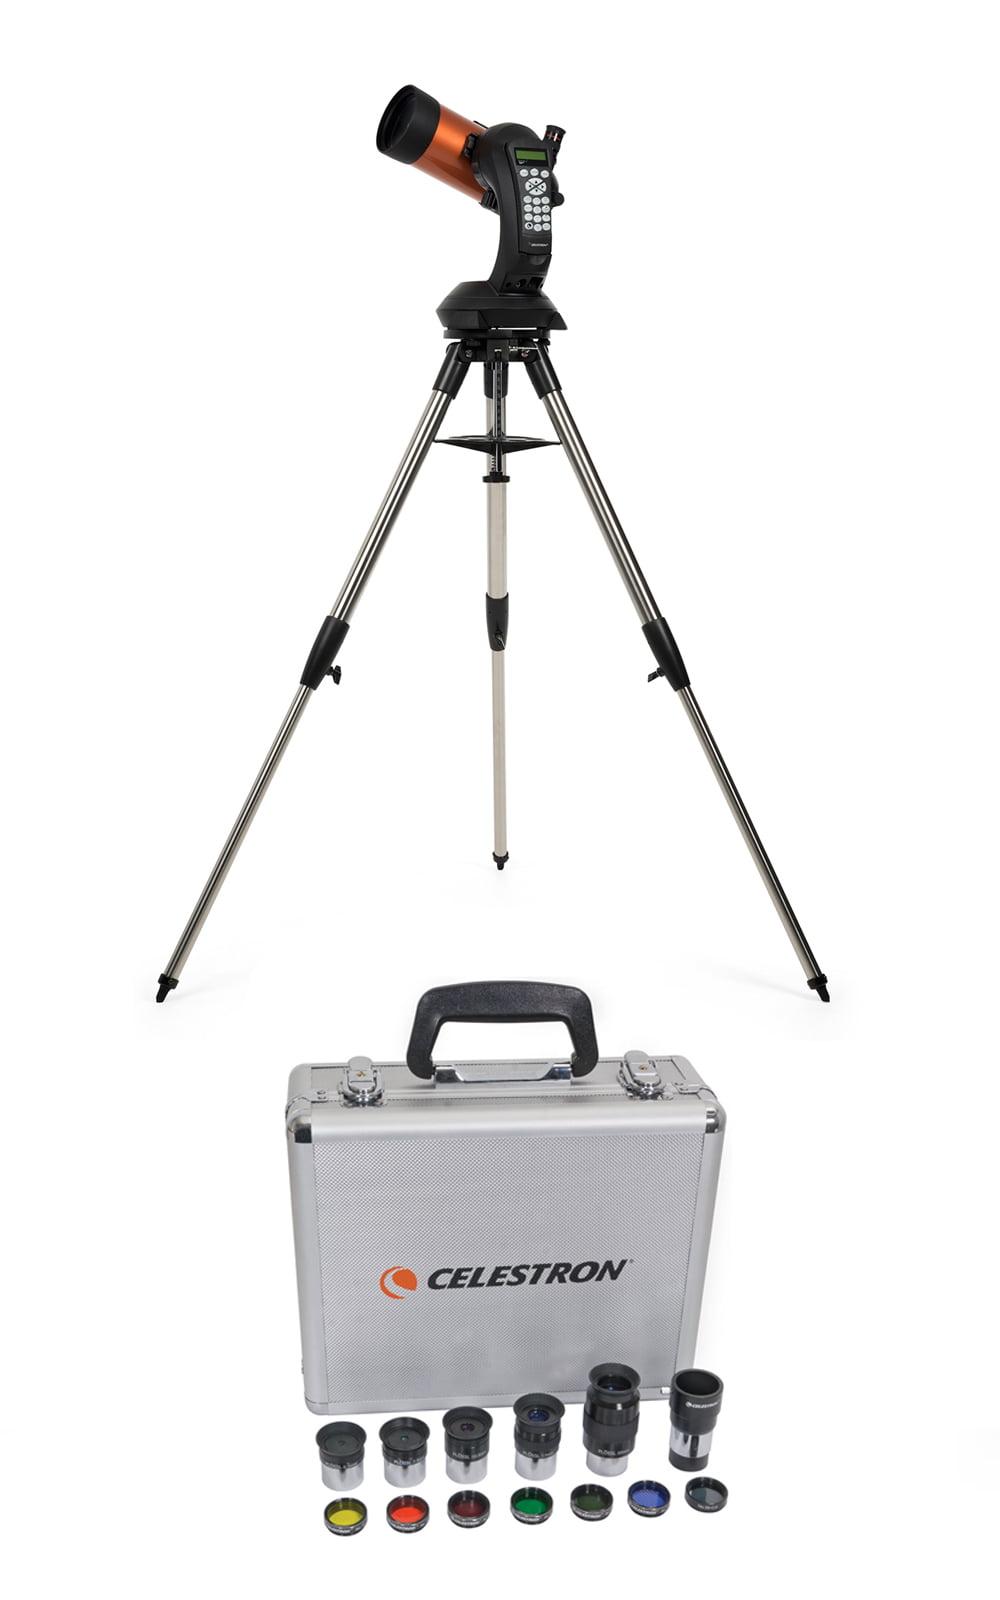 Celestron Nexstar 4SE Catadioptric Telescope & Eyepiece Filter Accessory Kit by Celestron International